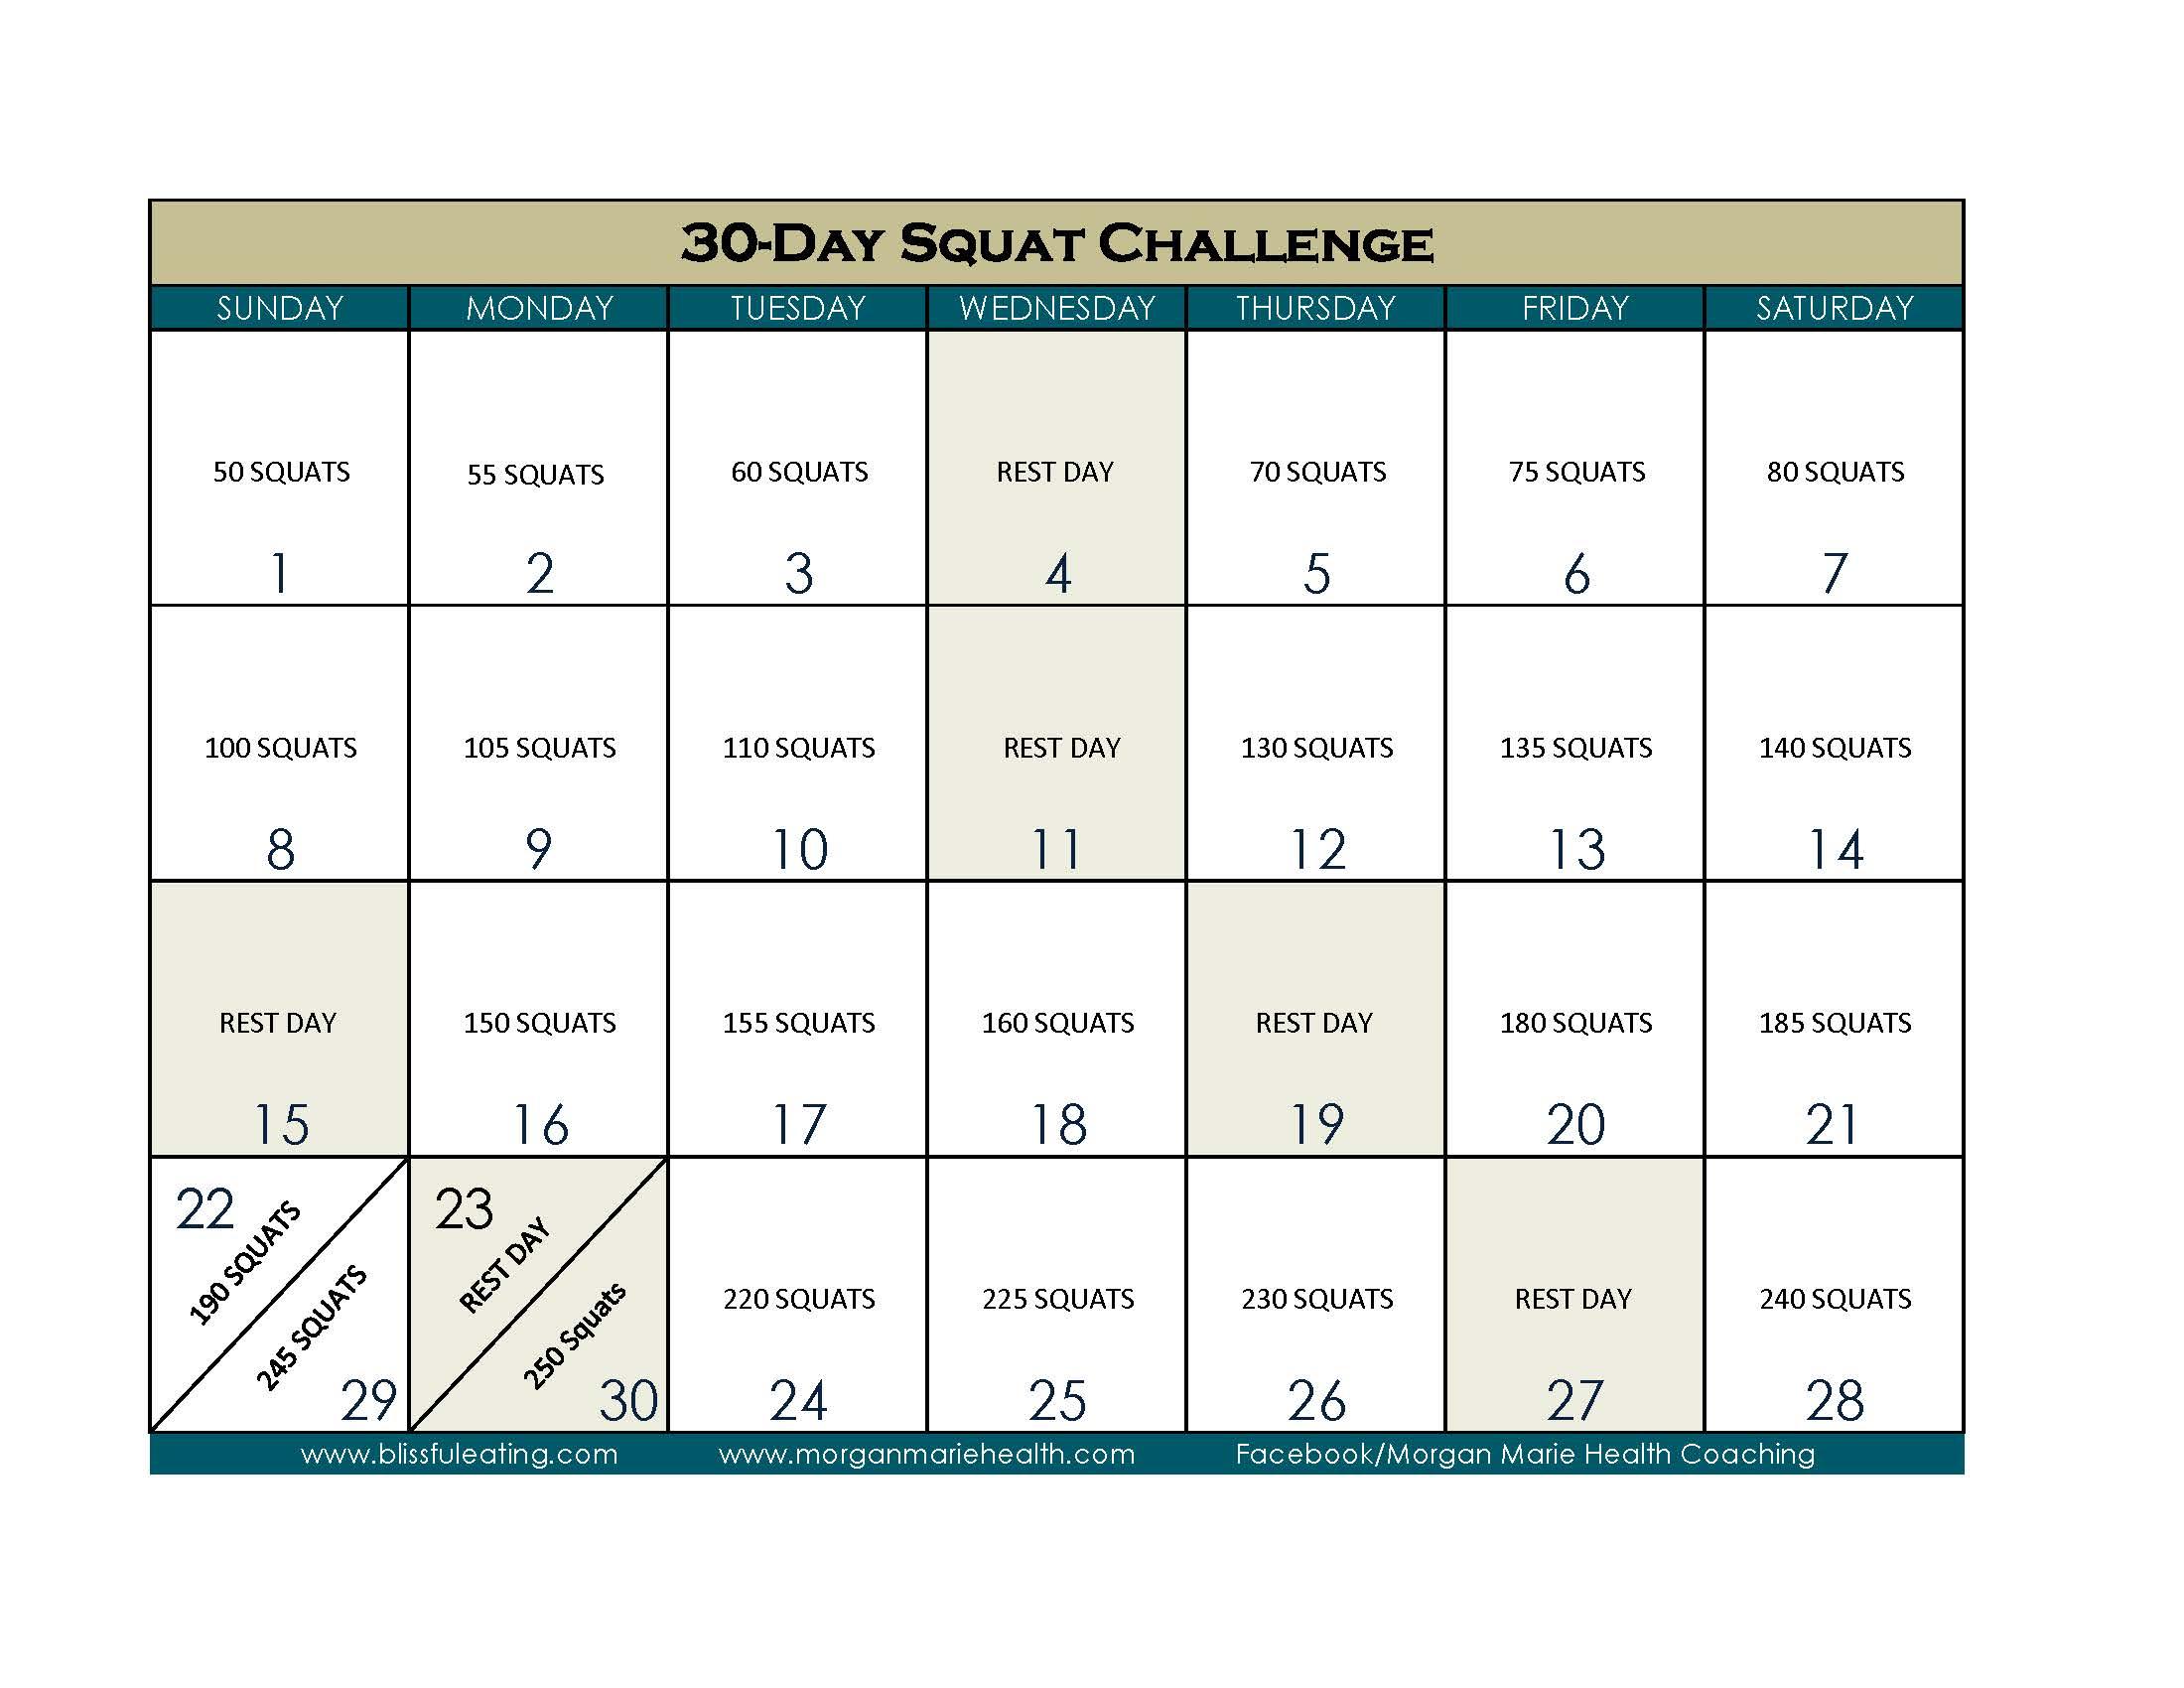 30 Days Squat Challenge Calendar | Printable Calendar 2020 regarding 30 Days Calendar